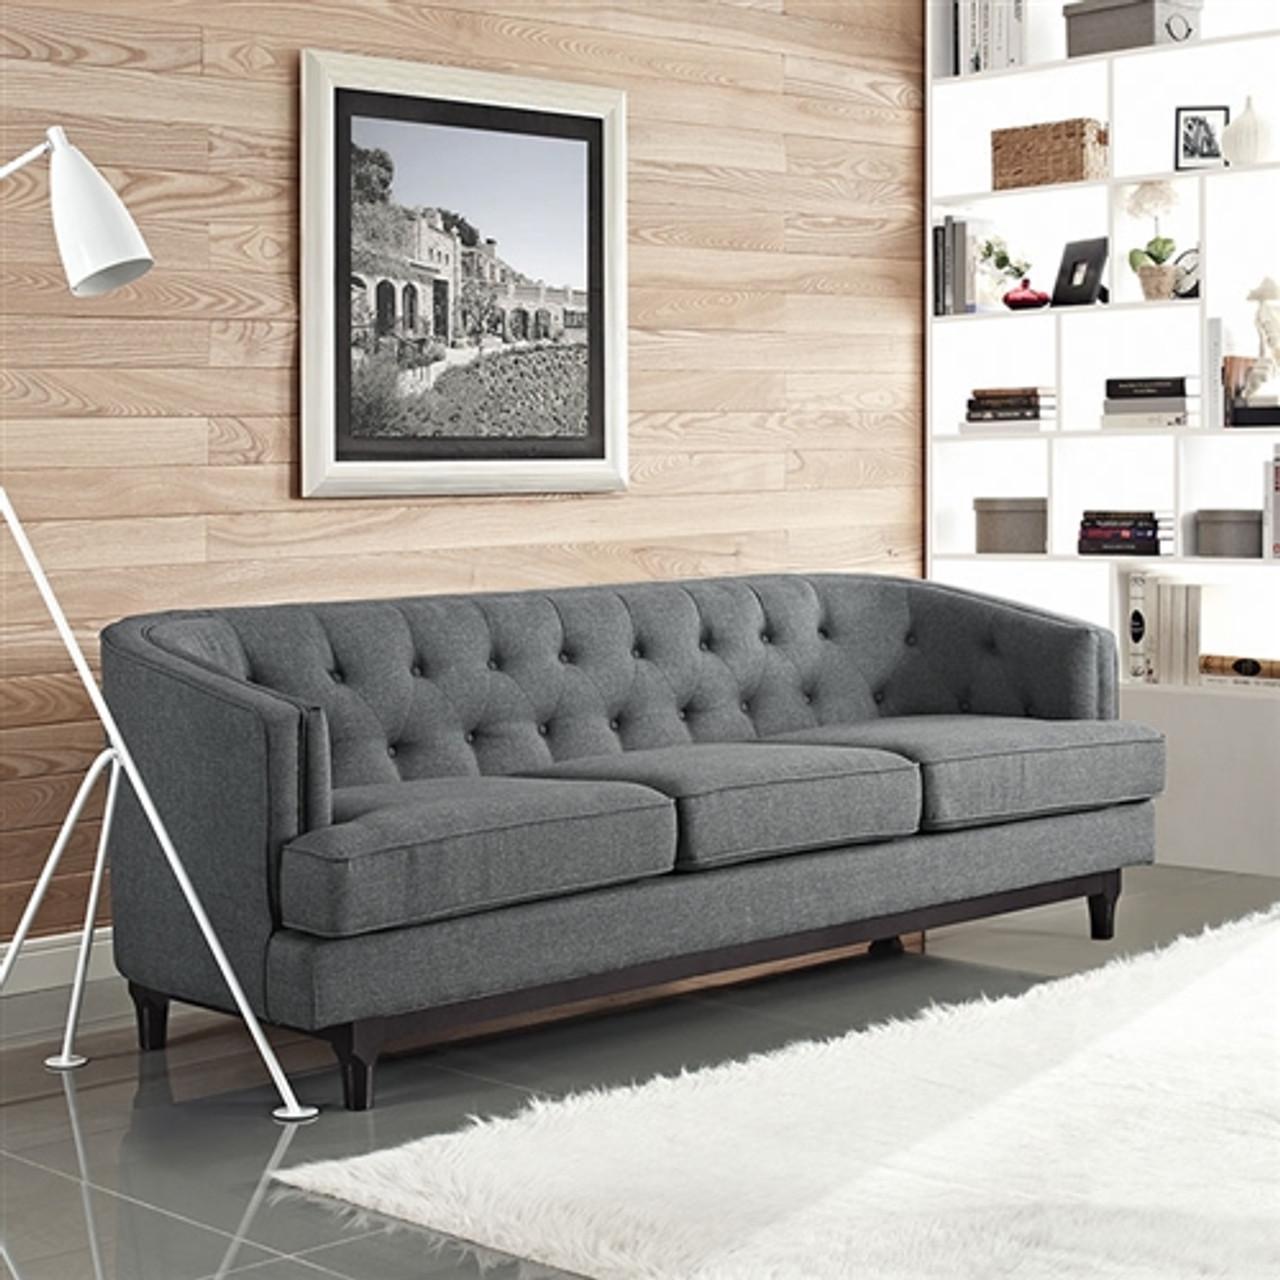 Modway Coast Contemporary Tufted Sofa EEI-2131